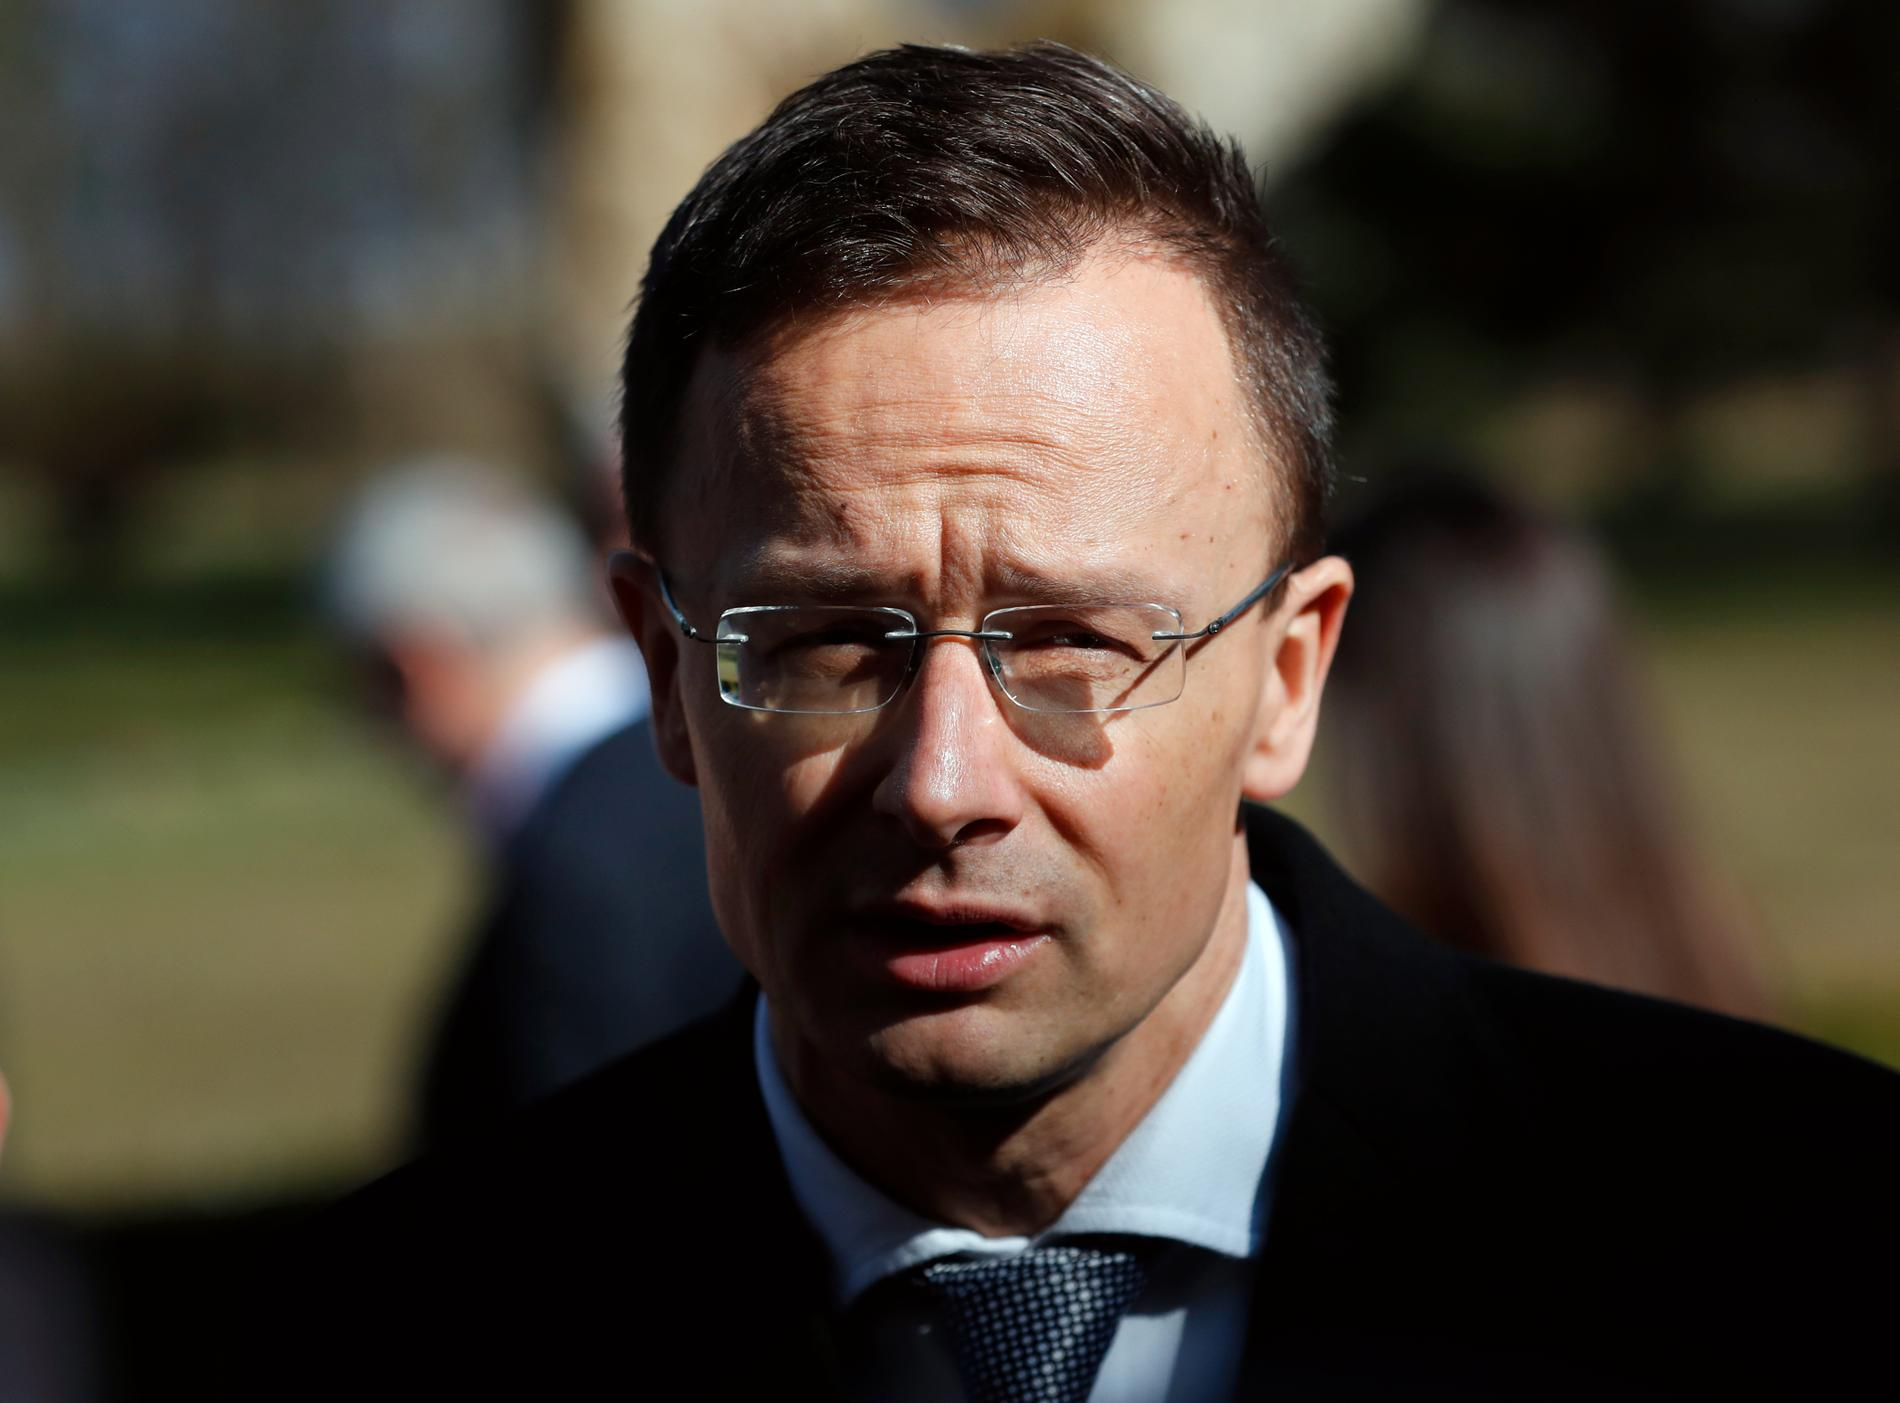 Ungerns utrikesminister Peter Szijjarto. Arkivbild.